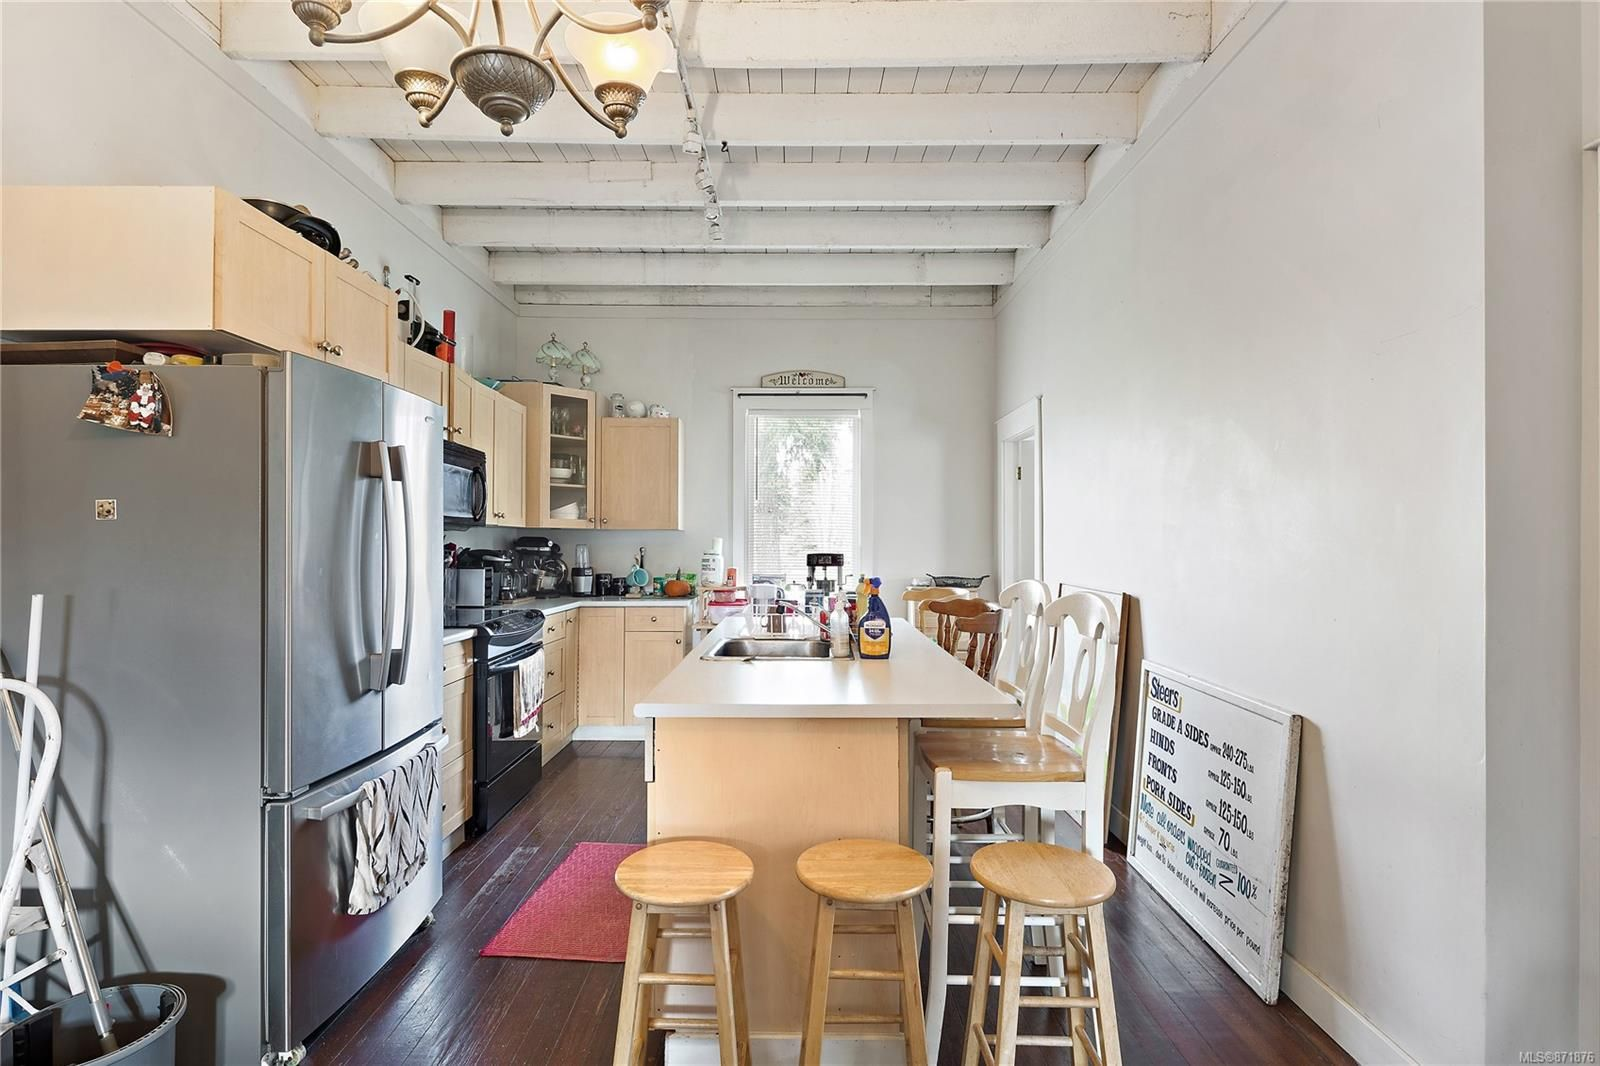 Photo 24: Photos: 4420 Wilkinson Rd in : SW Royal Oak House for sale (Saanich West)  : MLS®# 871876